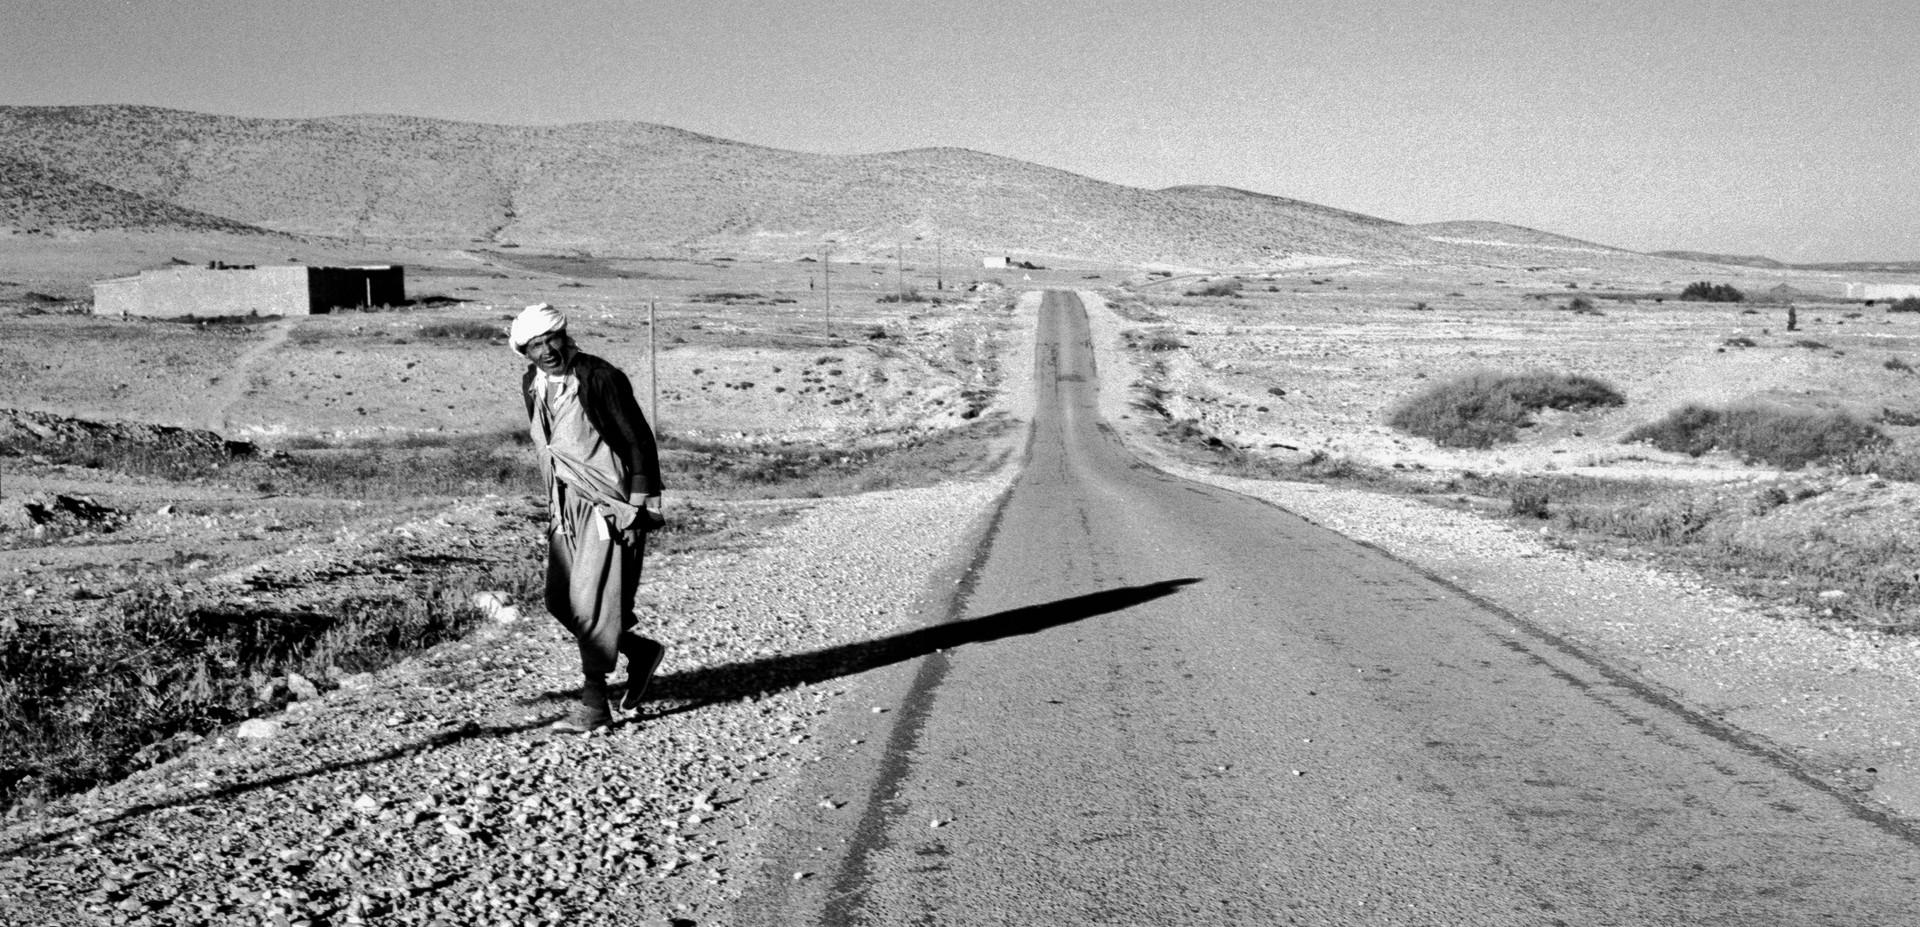 Near Oujda, Morocco 1986